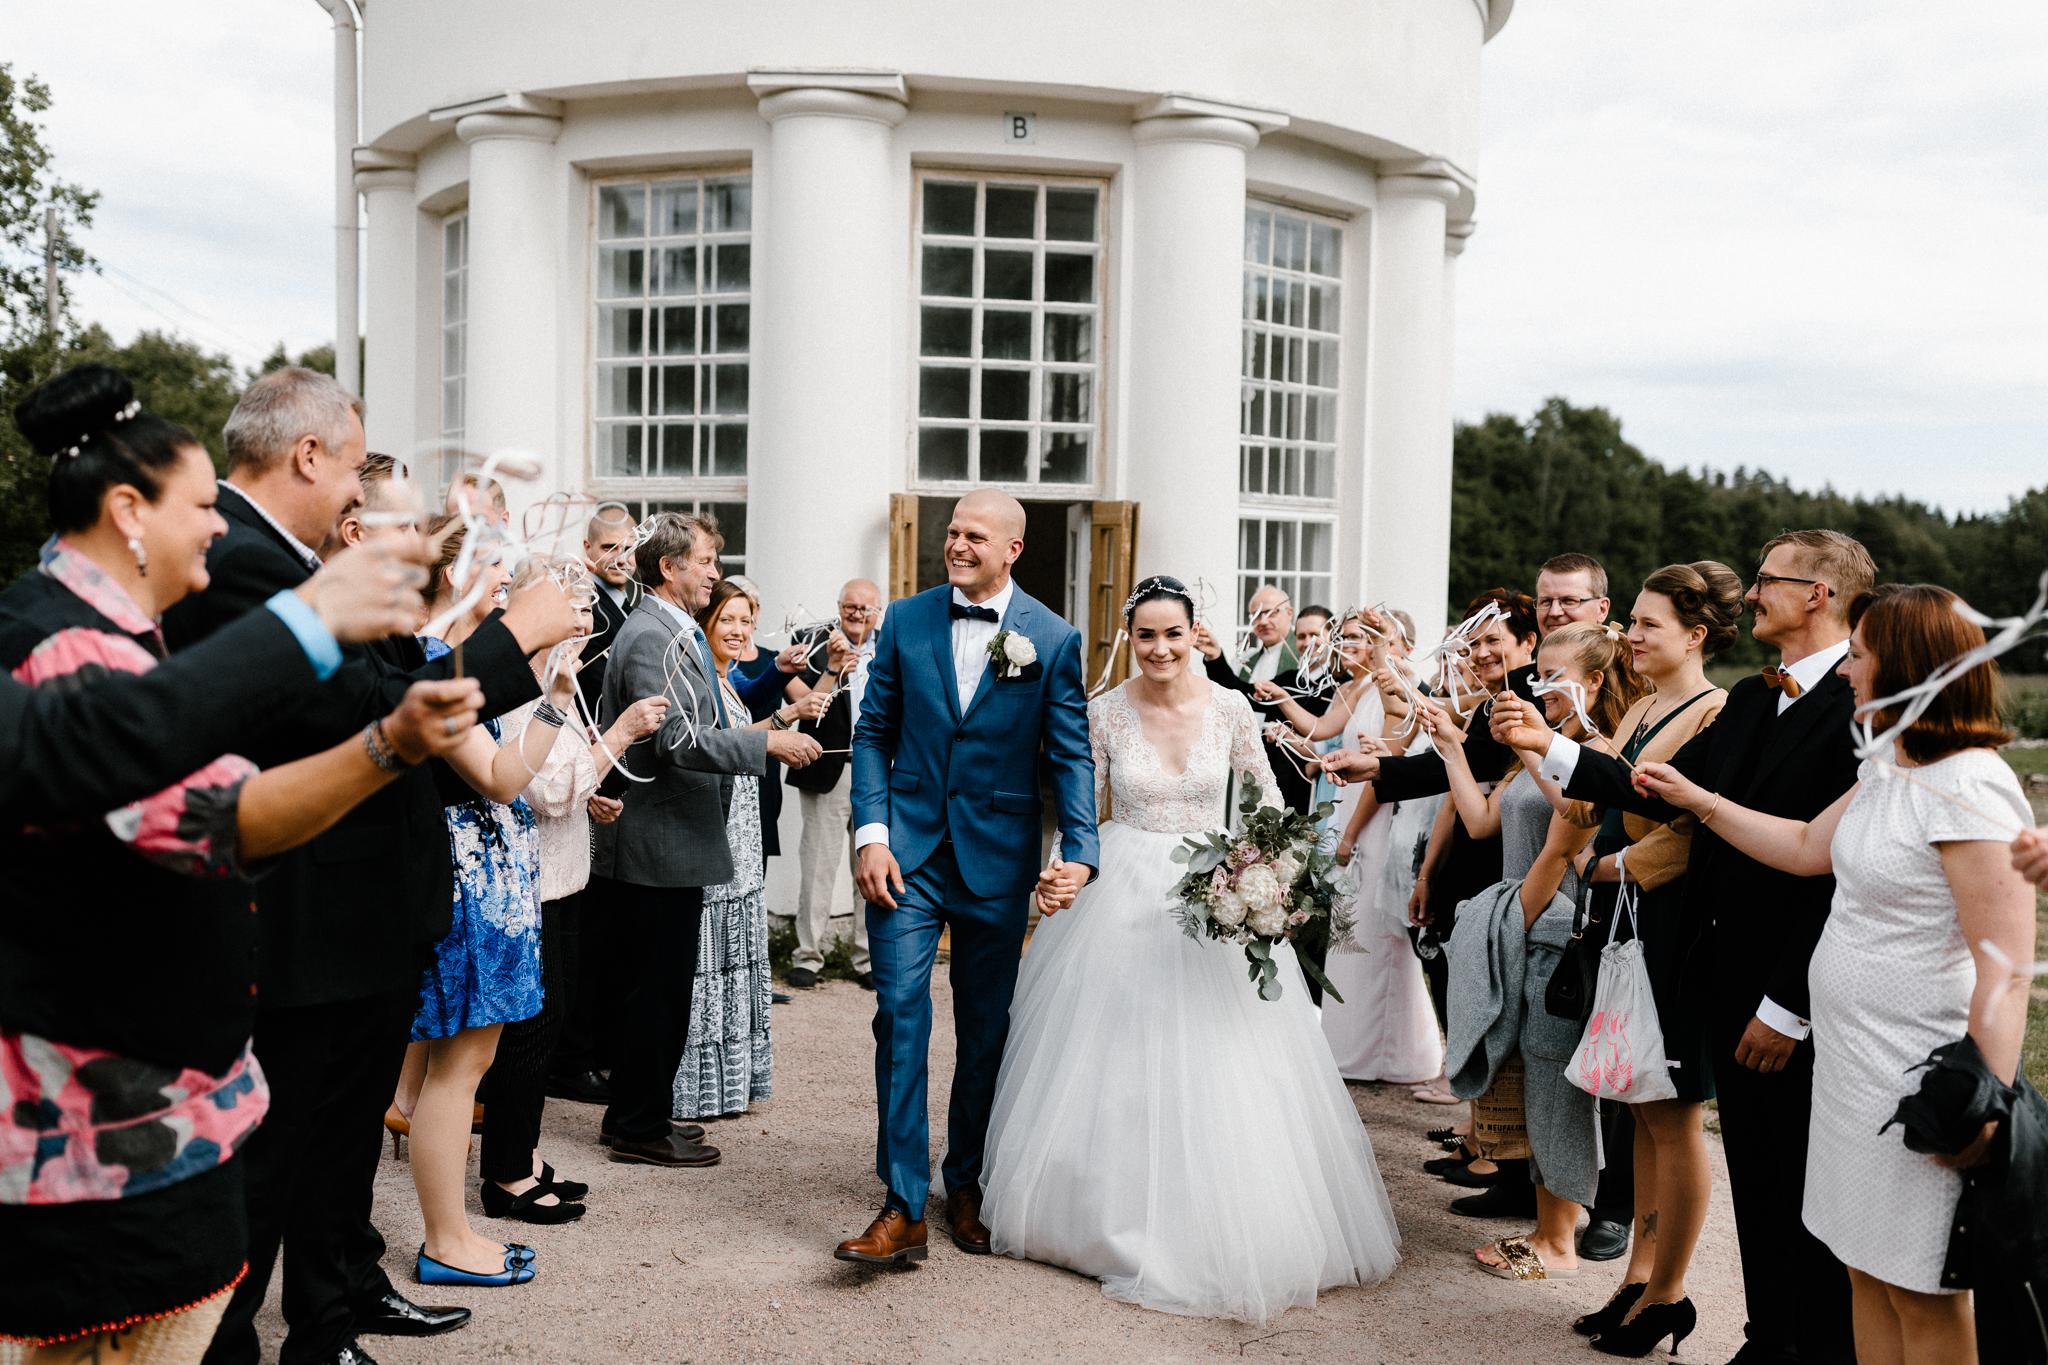 Essi + Ville   Oitbacka Gården   by Patrick Karkkolainen Wedding Photography-168.jpg